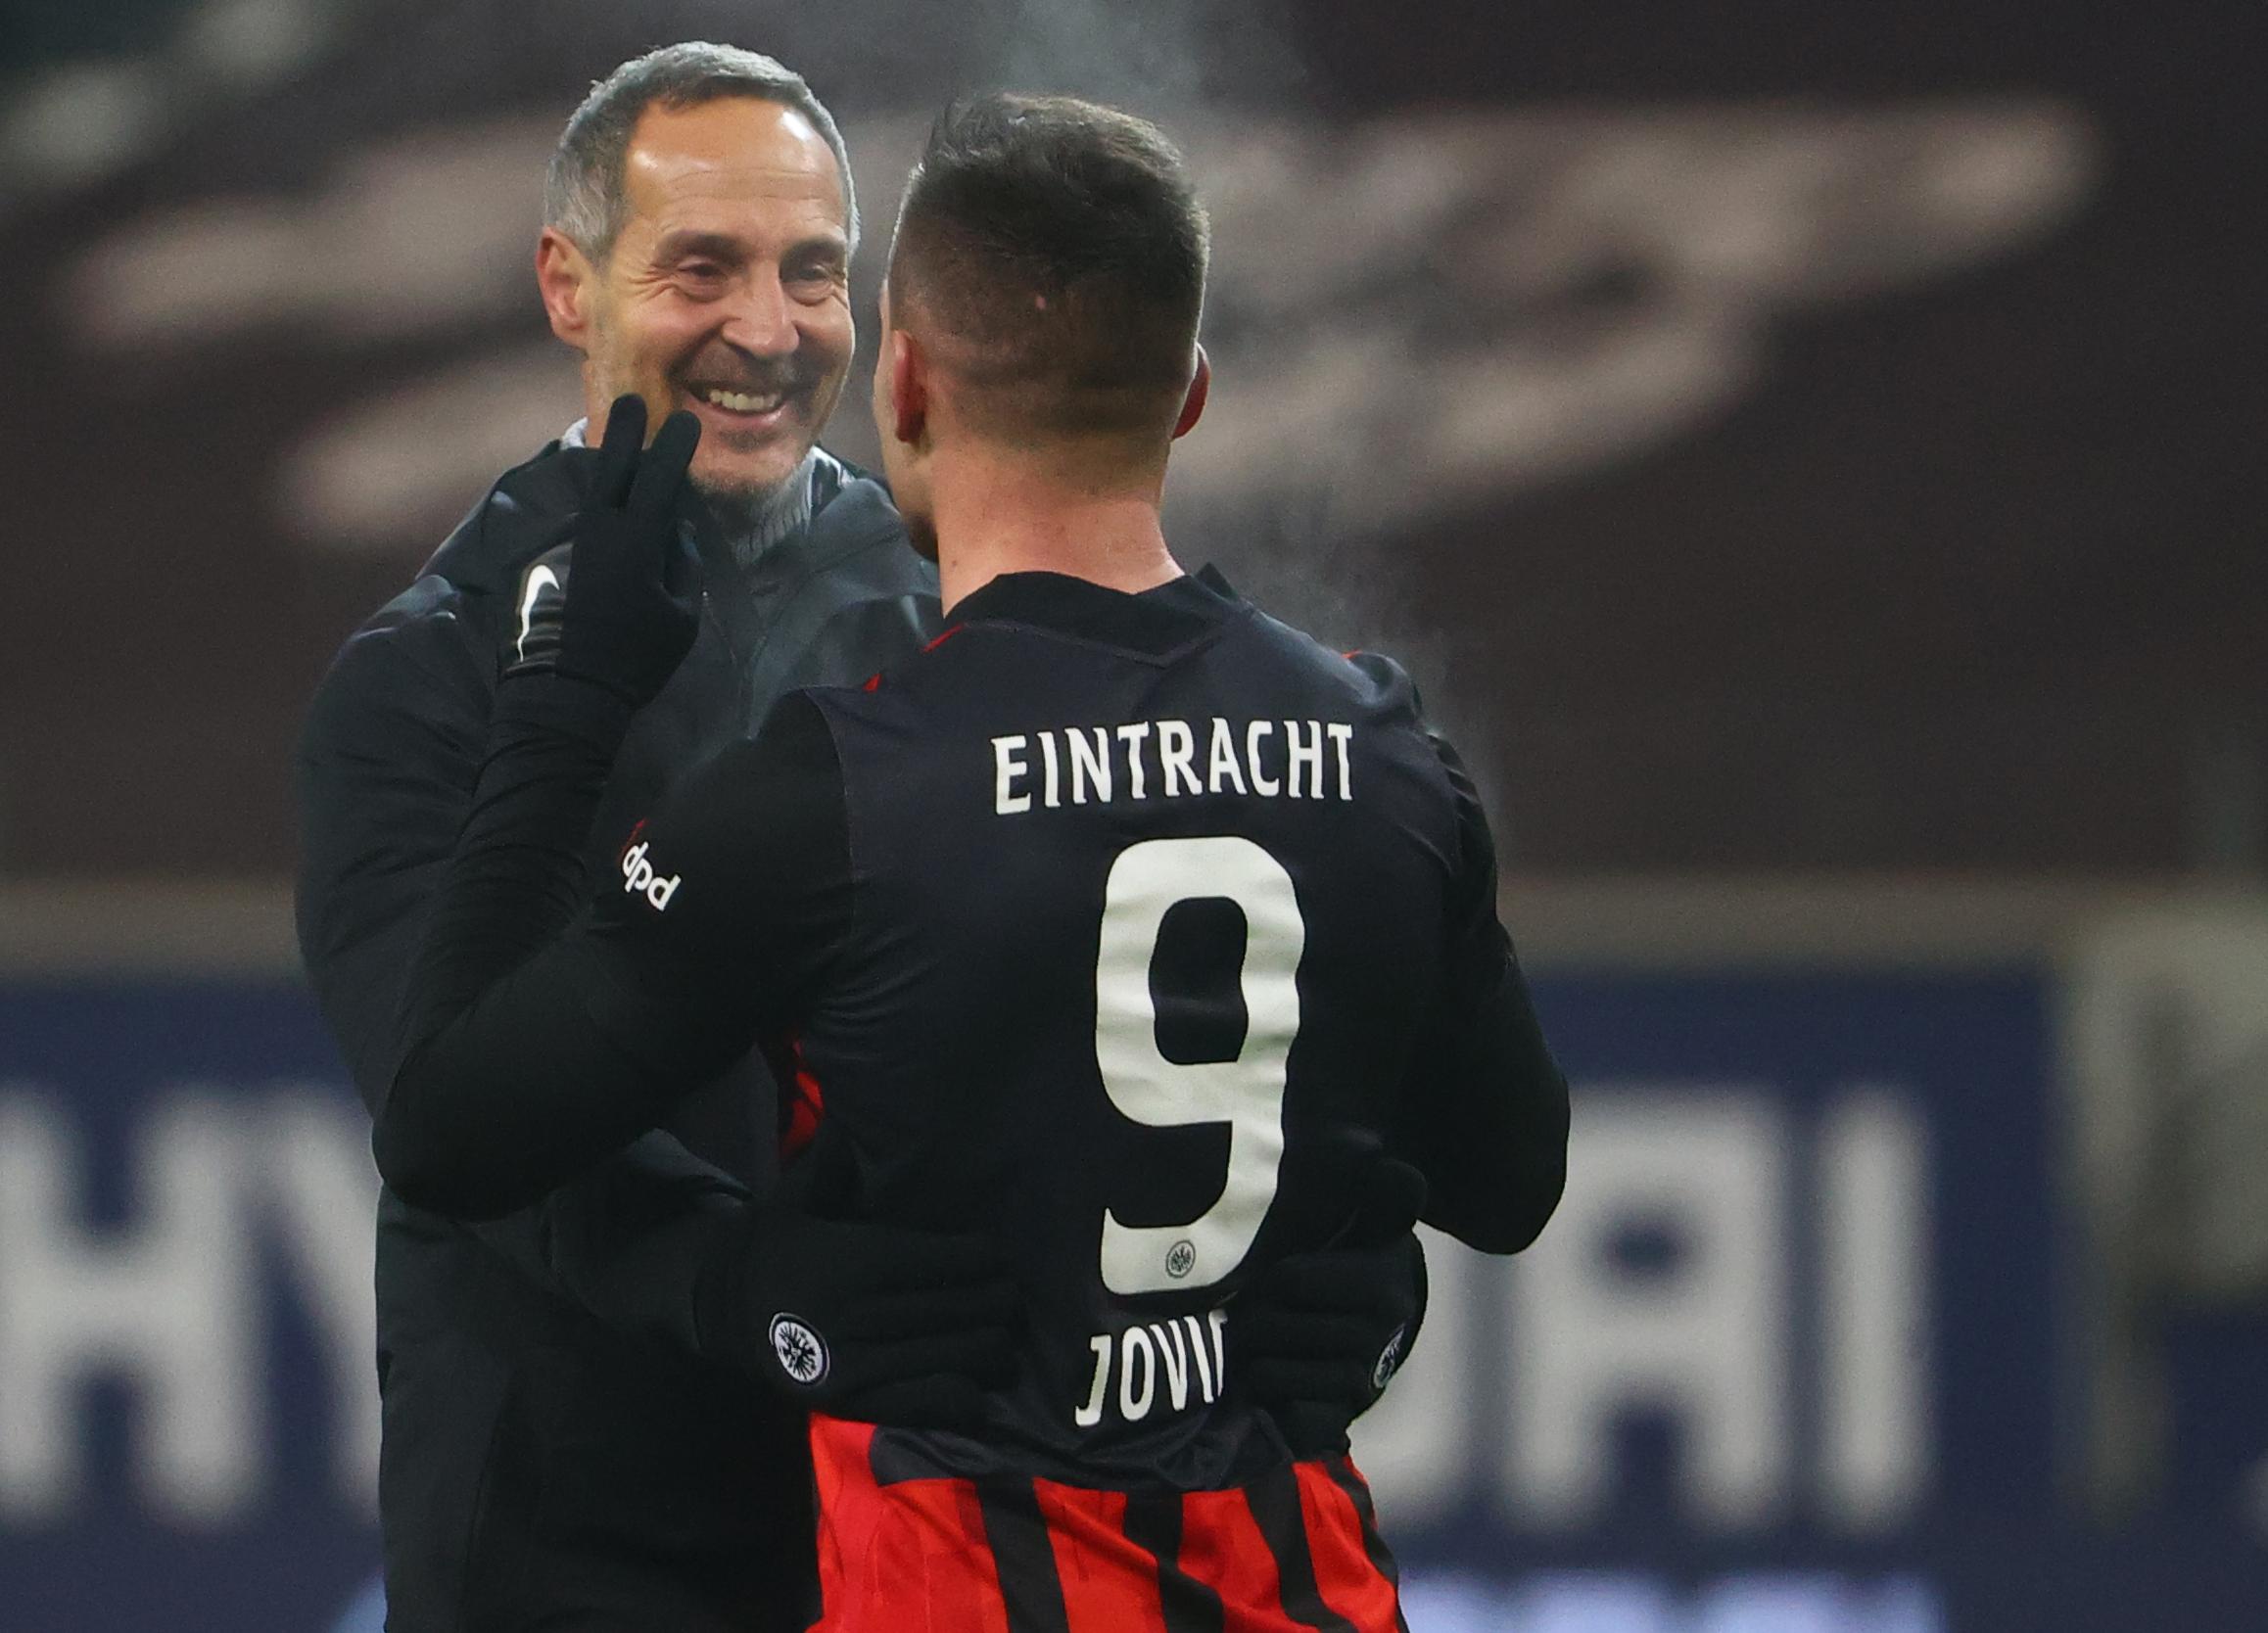 Atlético, Eintracht, y Real Madrid: 2 fichajes a 3 bandas